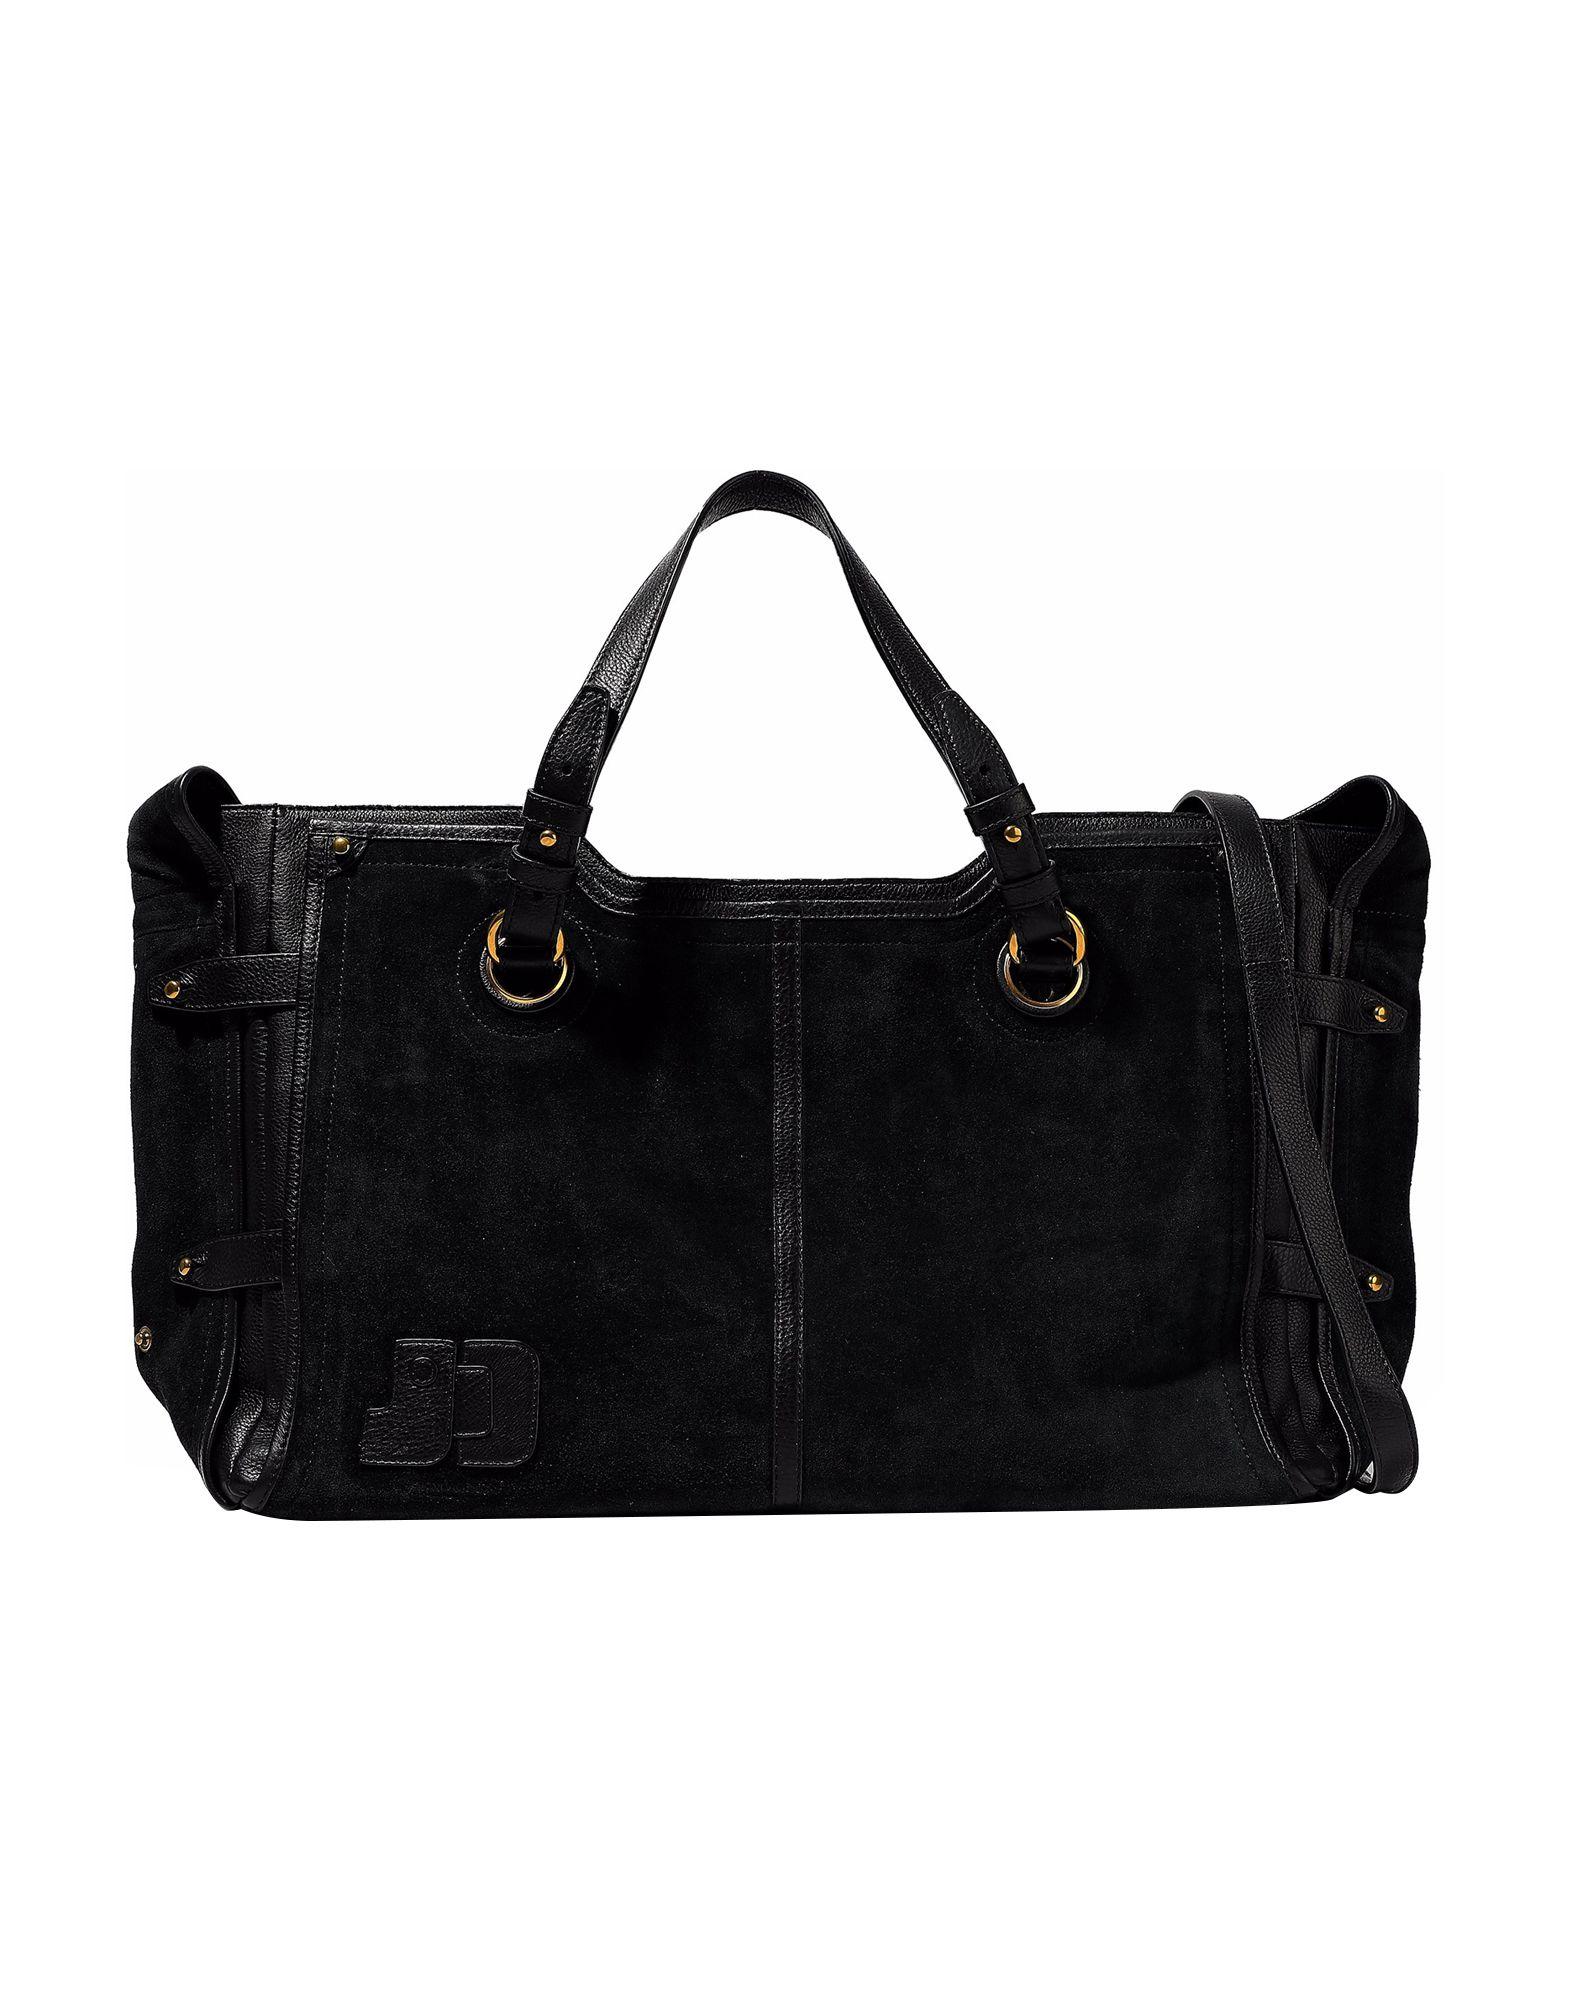 58670878af1b Jérôme Dreyfuss Handbag - Women Jérôme Dreyfuss Handbags online on ...